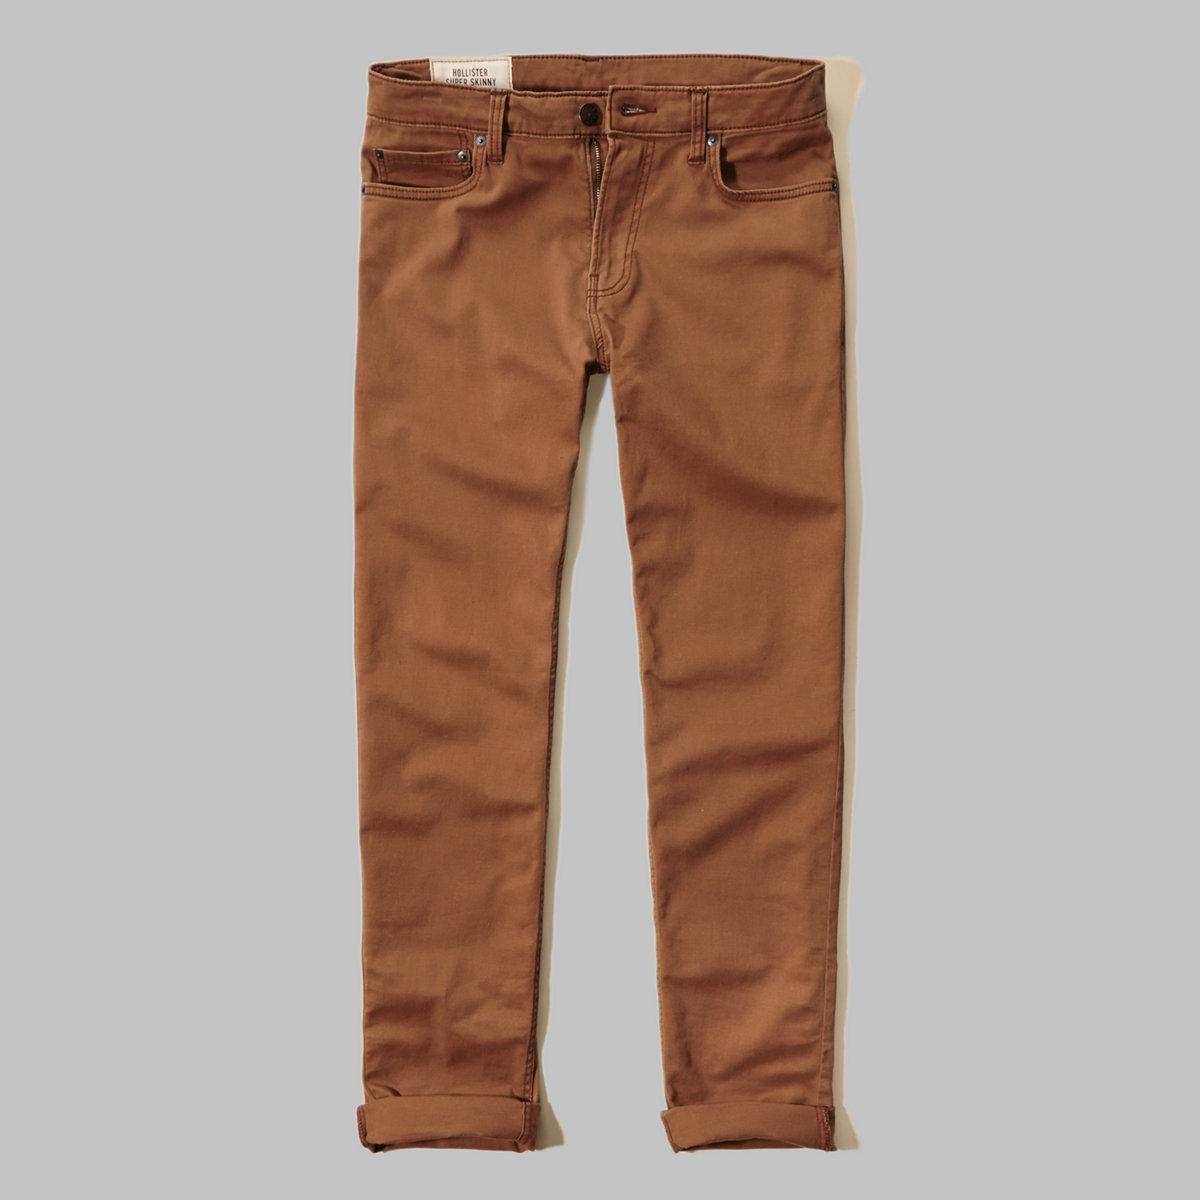 Super Skinny 5 Pocket Zipper Fly Pants